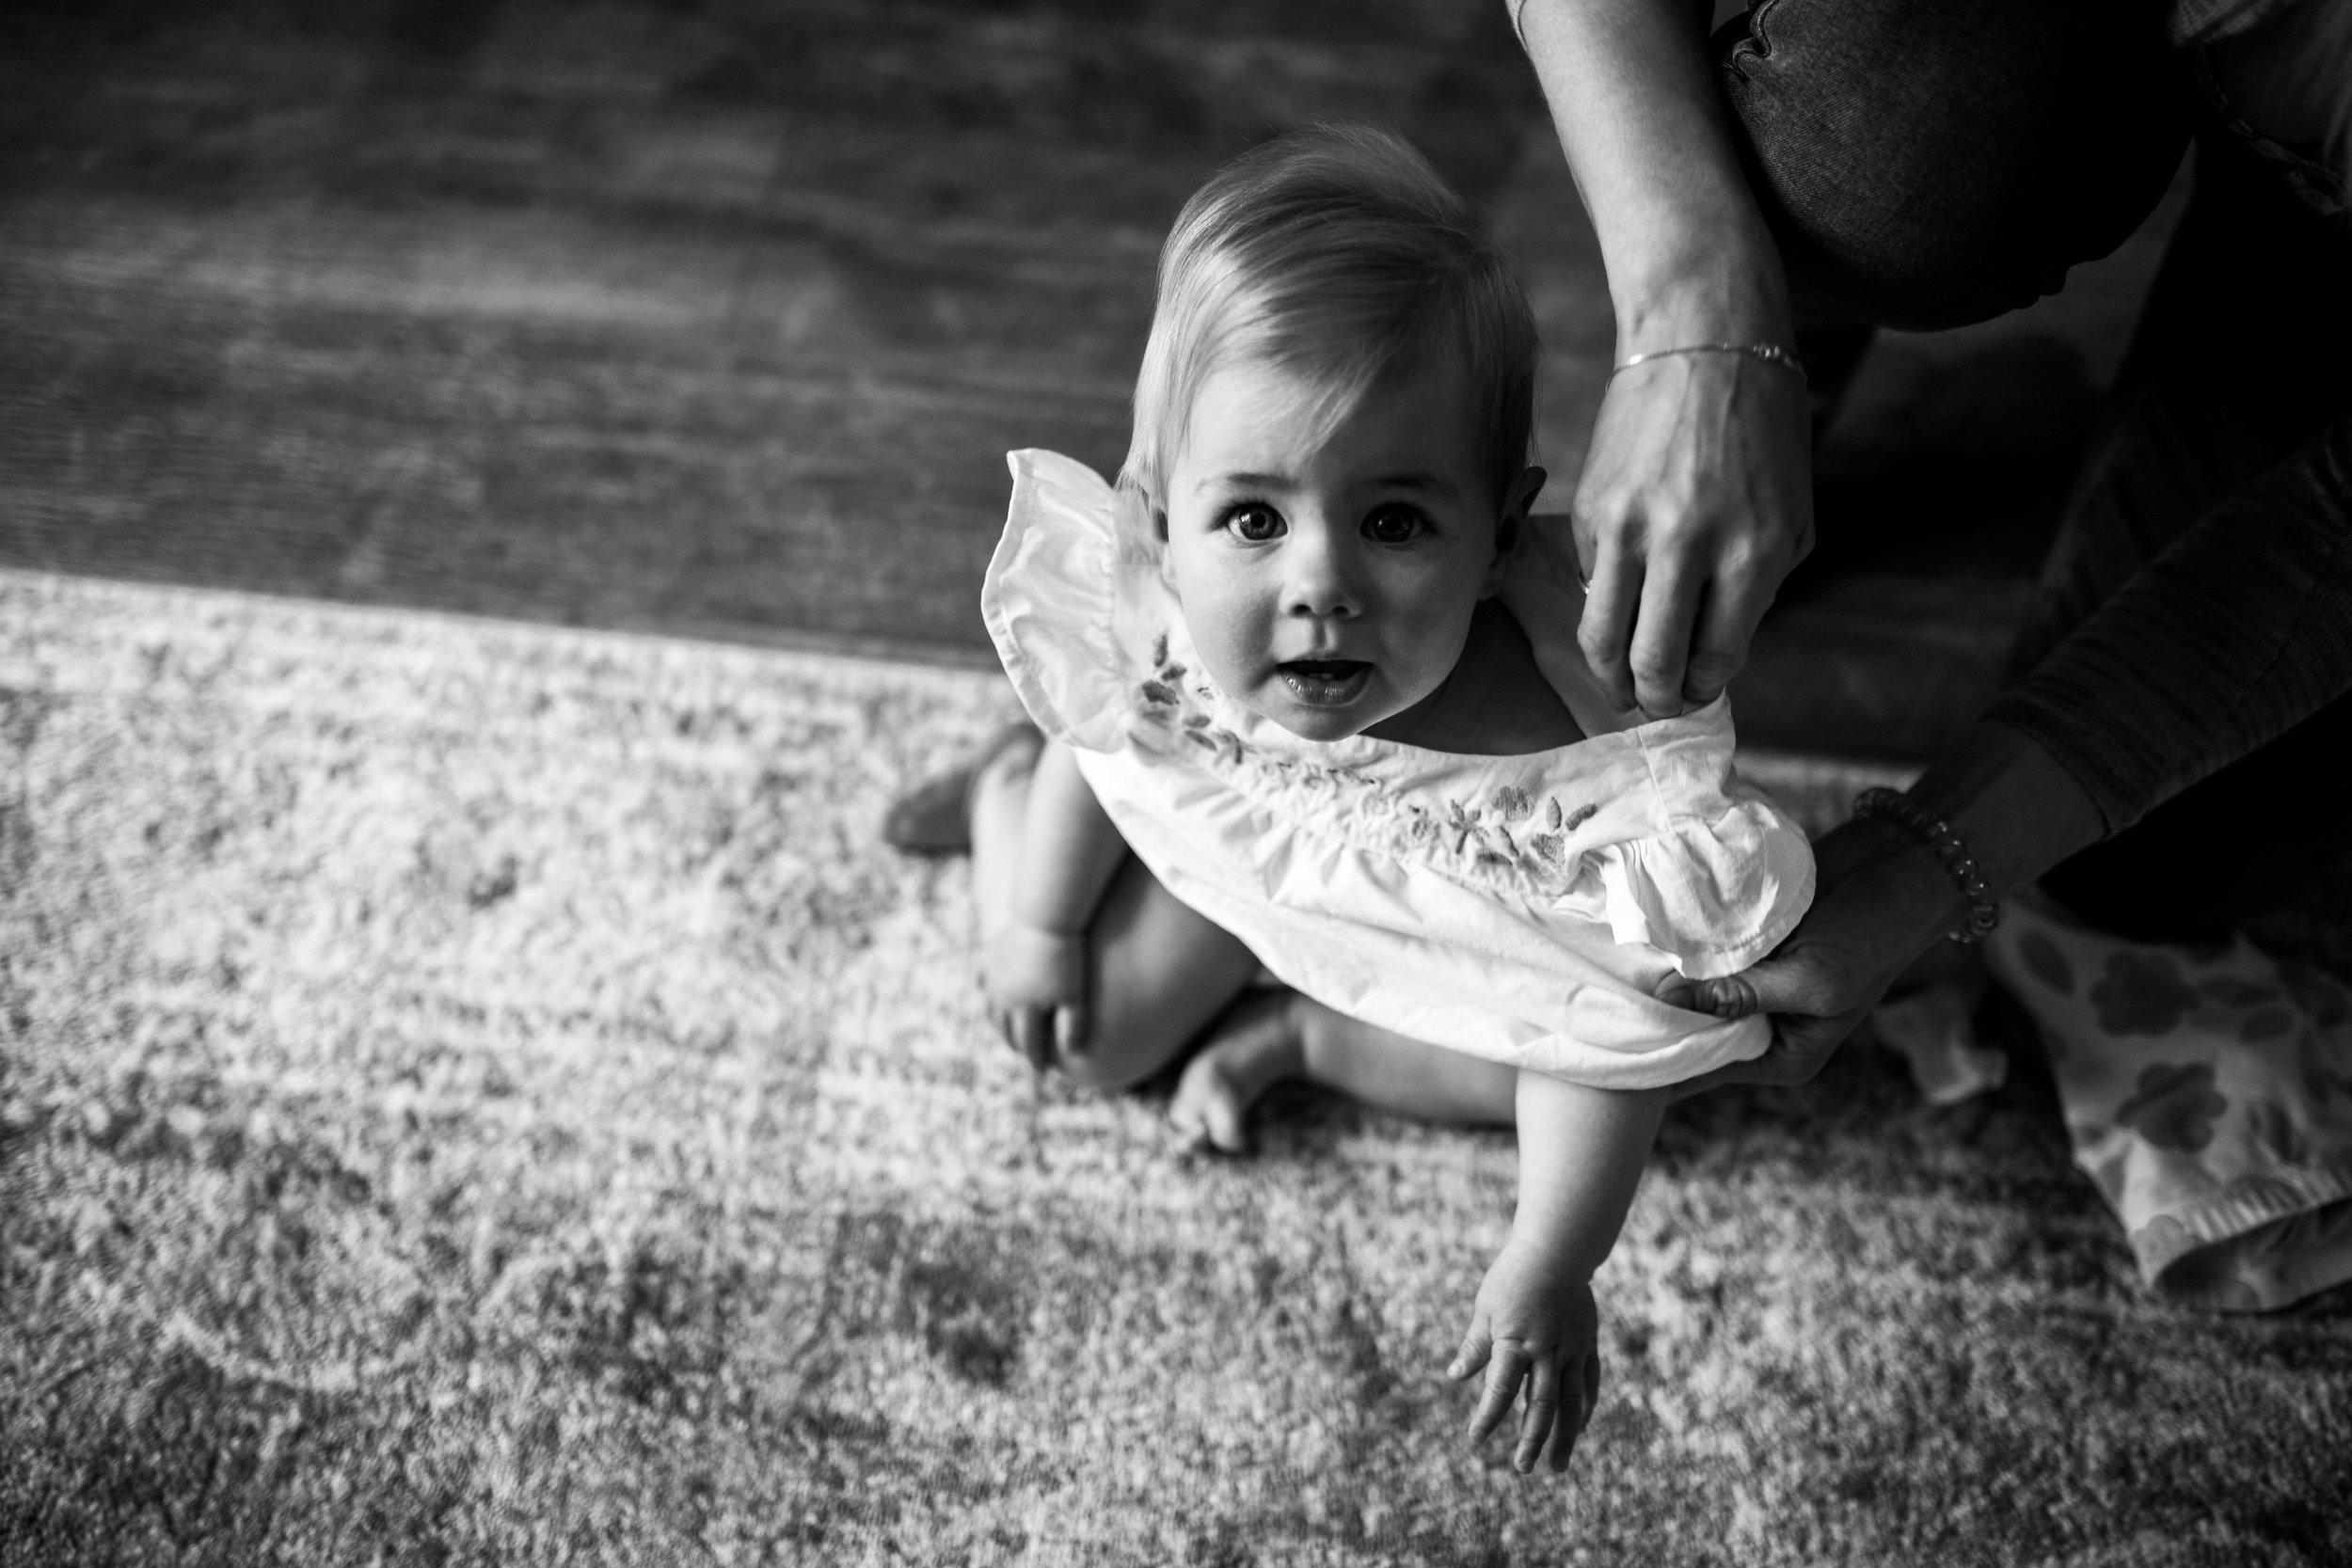 Lifestyle_Photography_parentandme_byShabanaPhotography_LR_B&W_Sam-4619.jpg